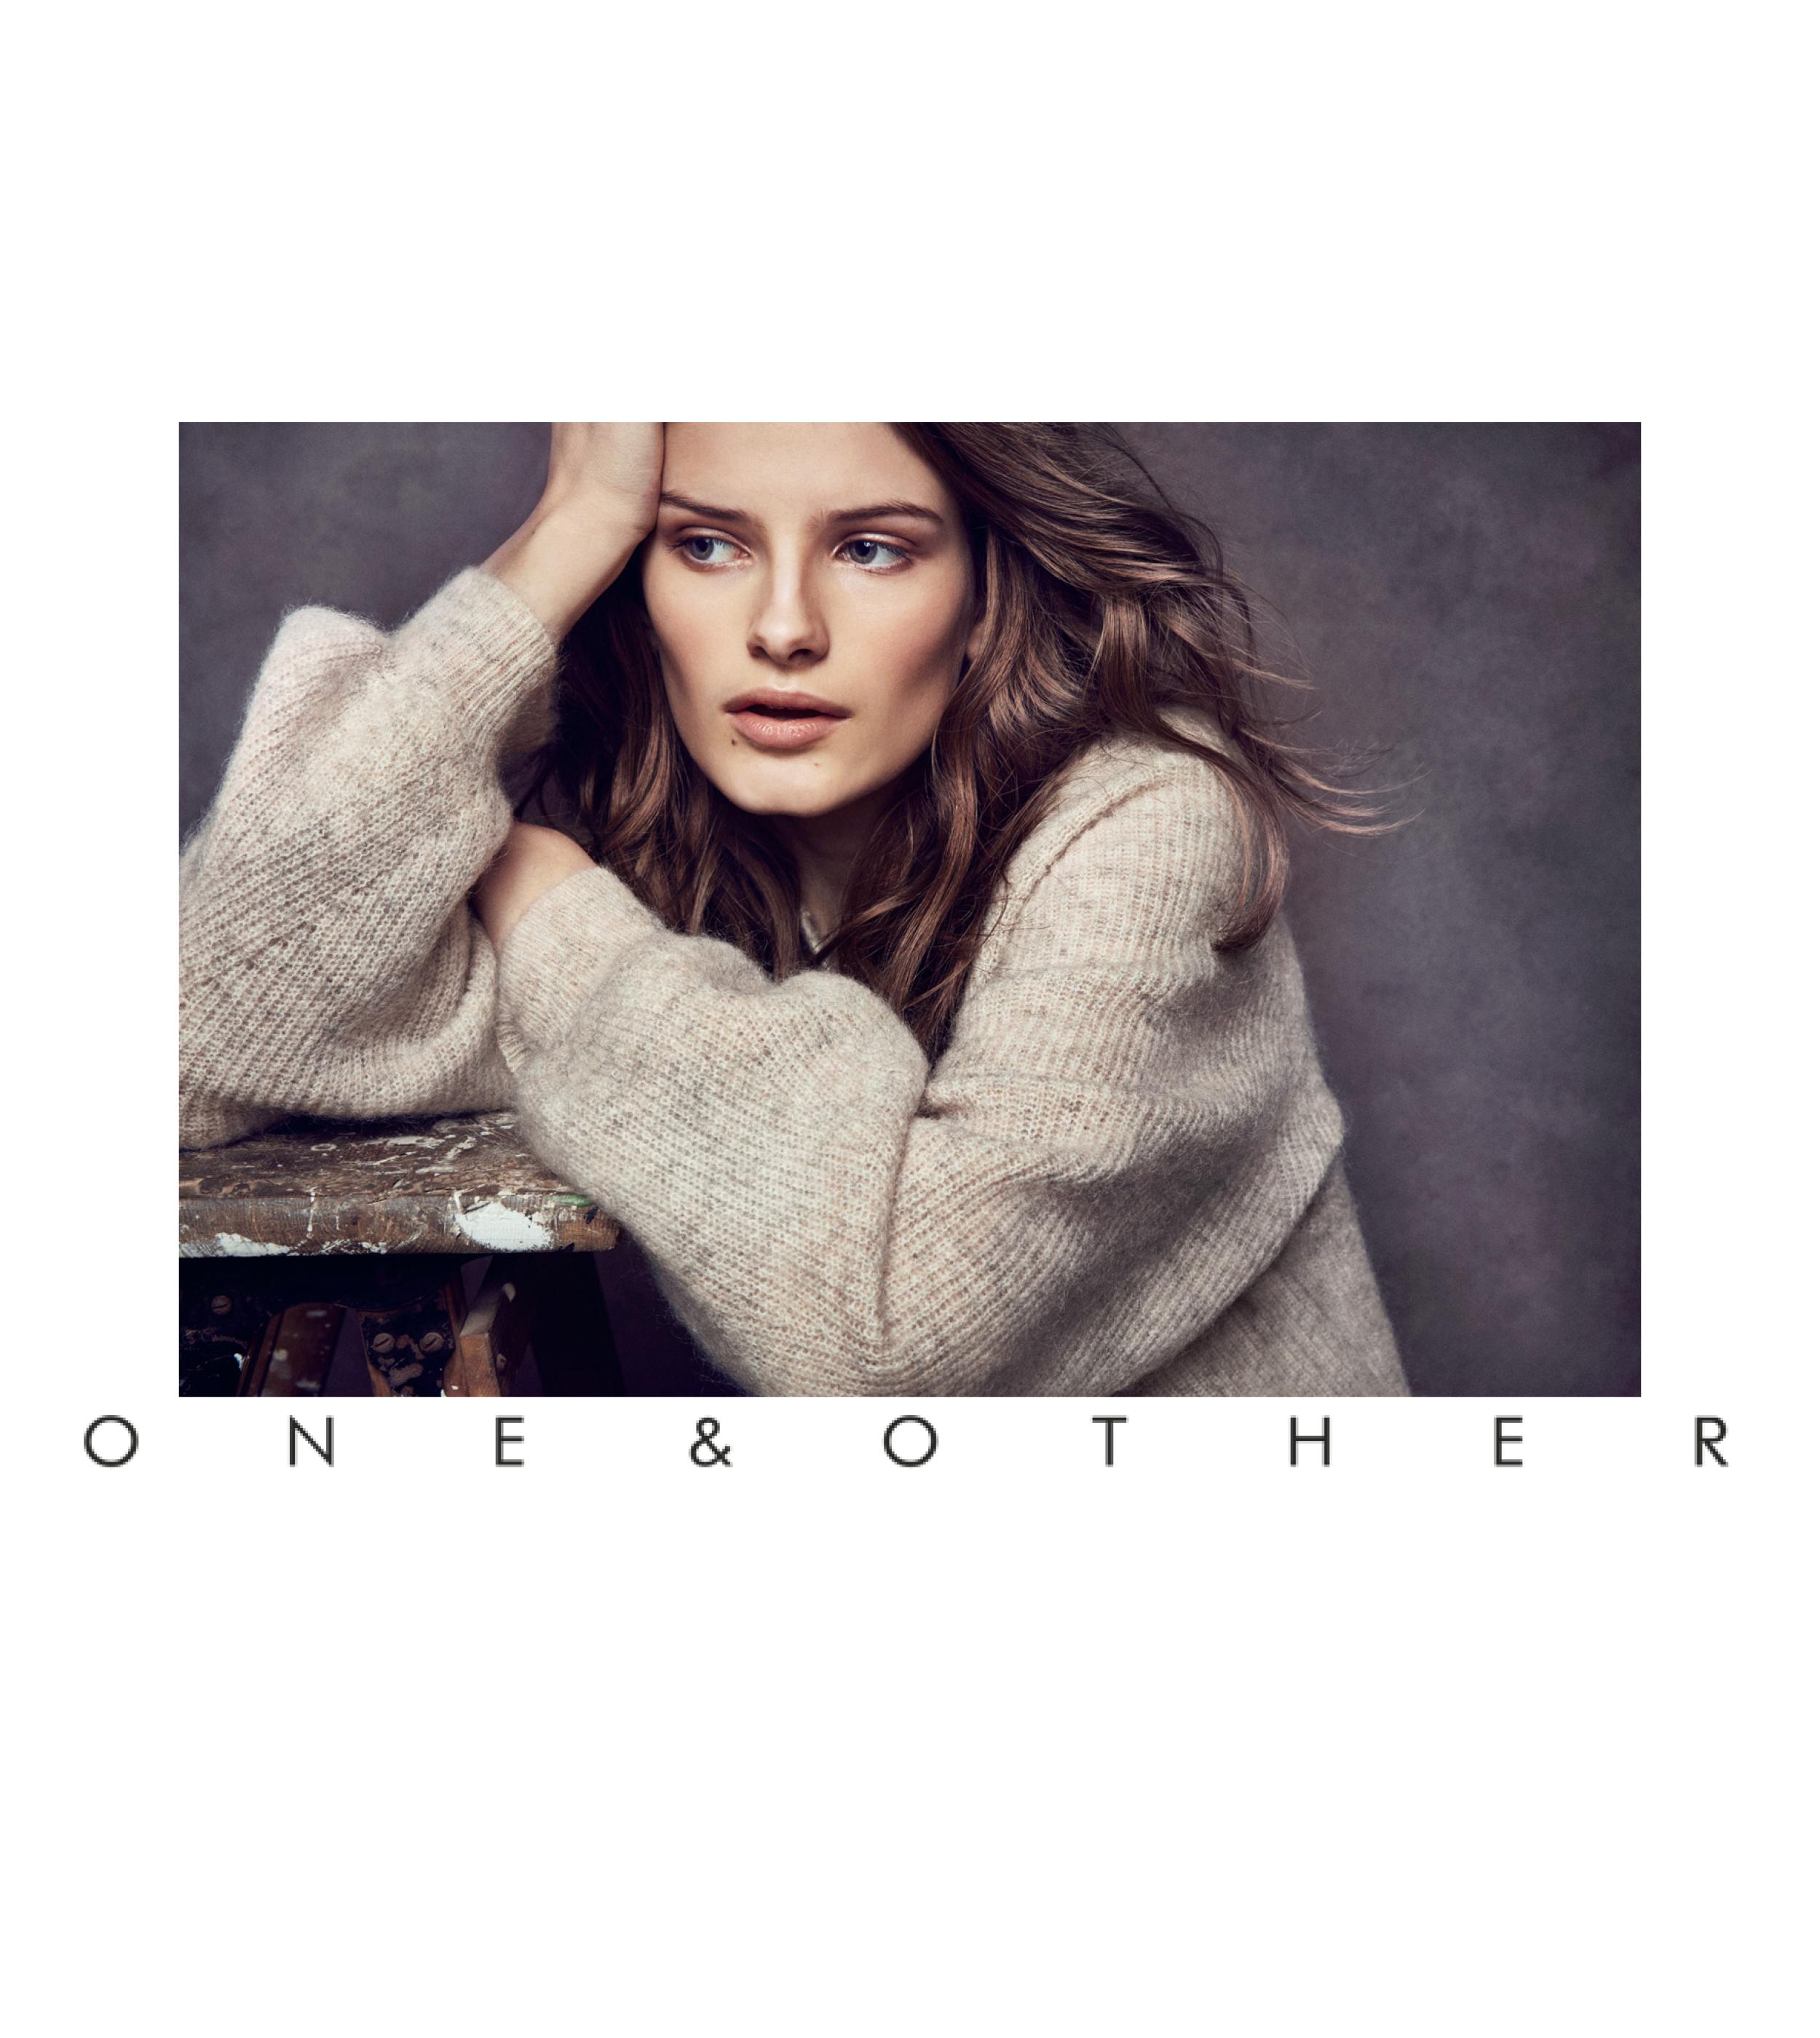 oneotherr5.jpg